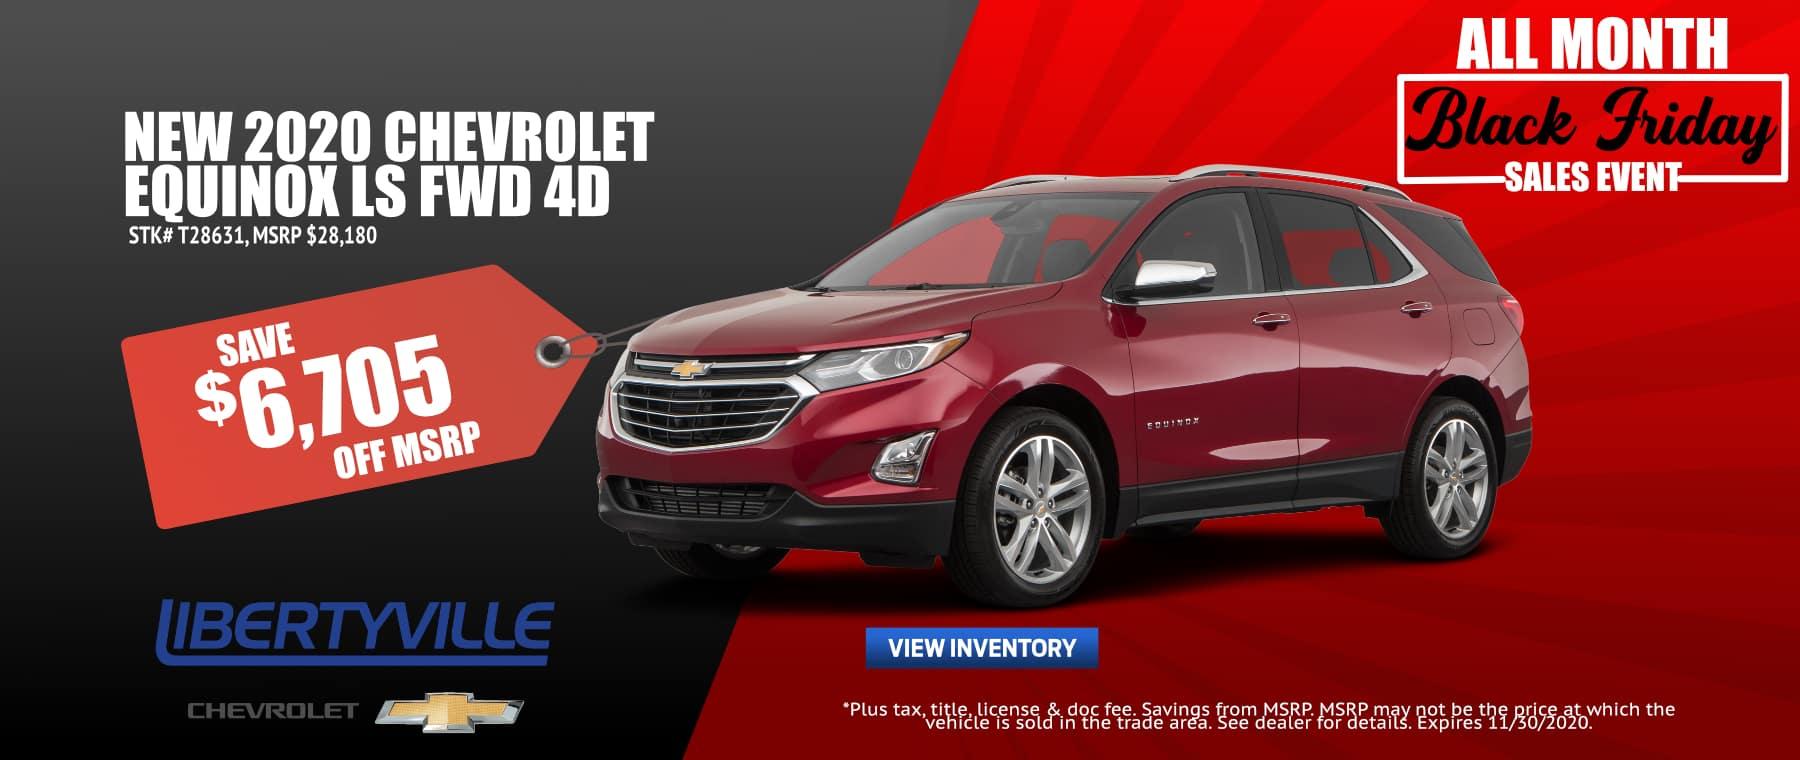 November-2020_EQUINOX_LIbertyville Chevrolet